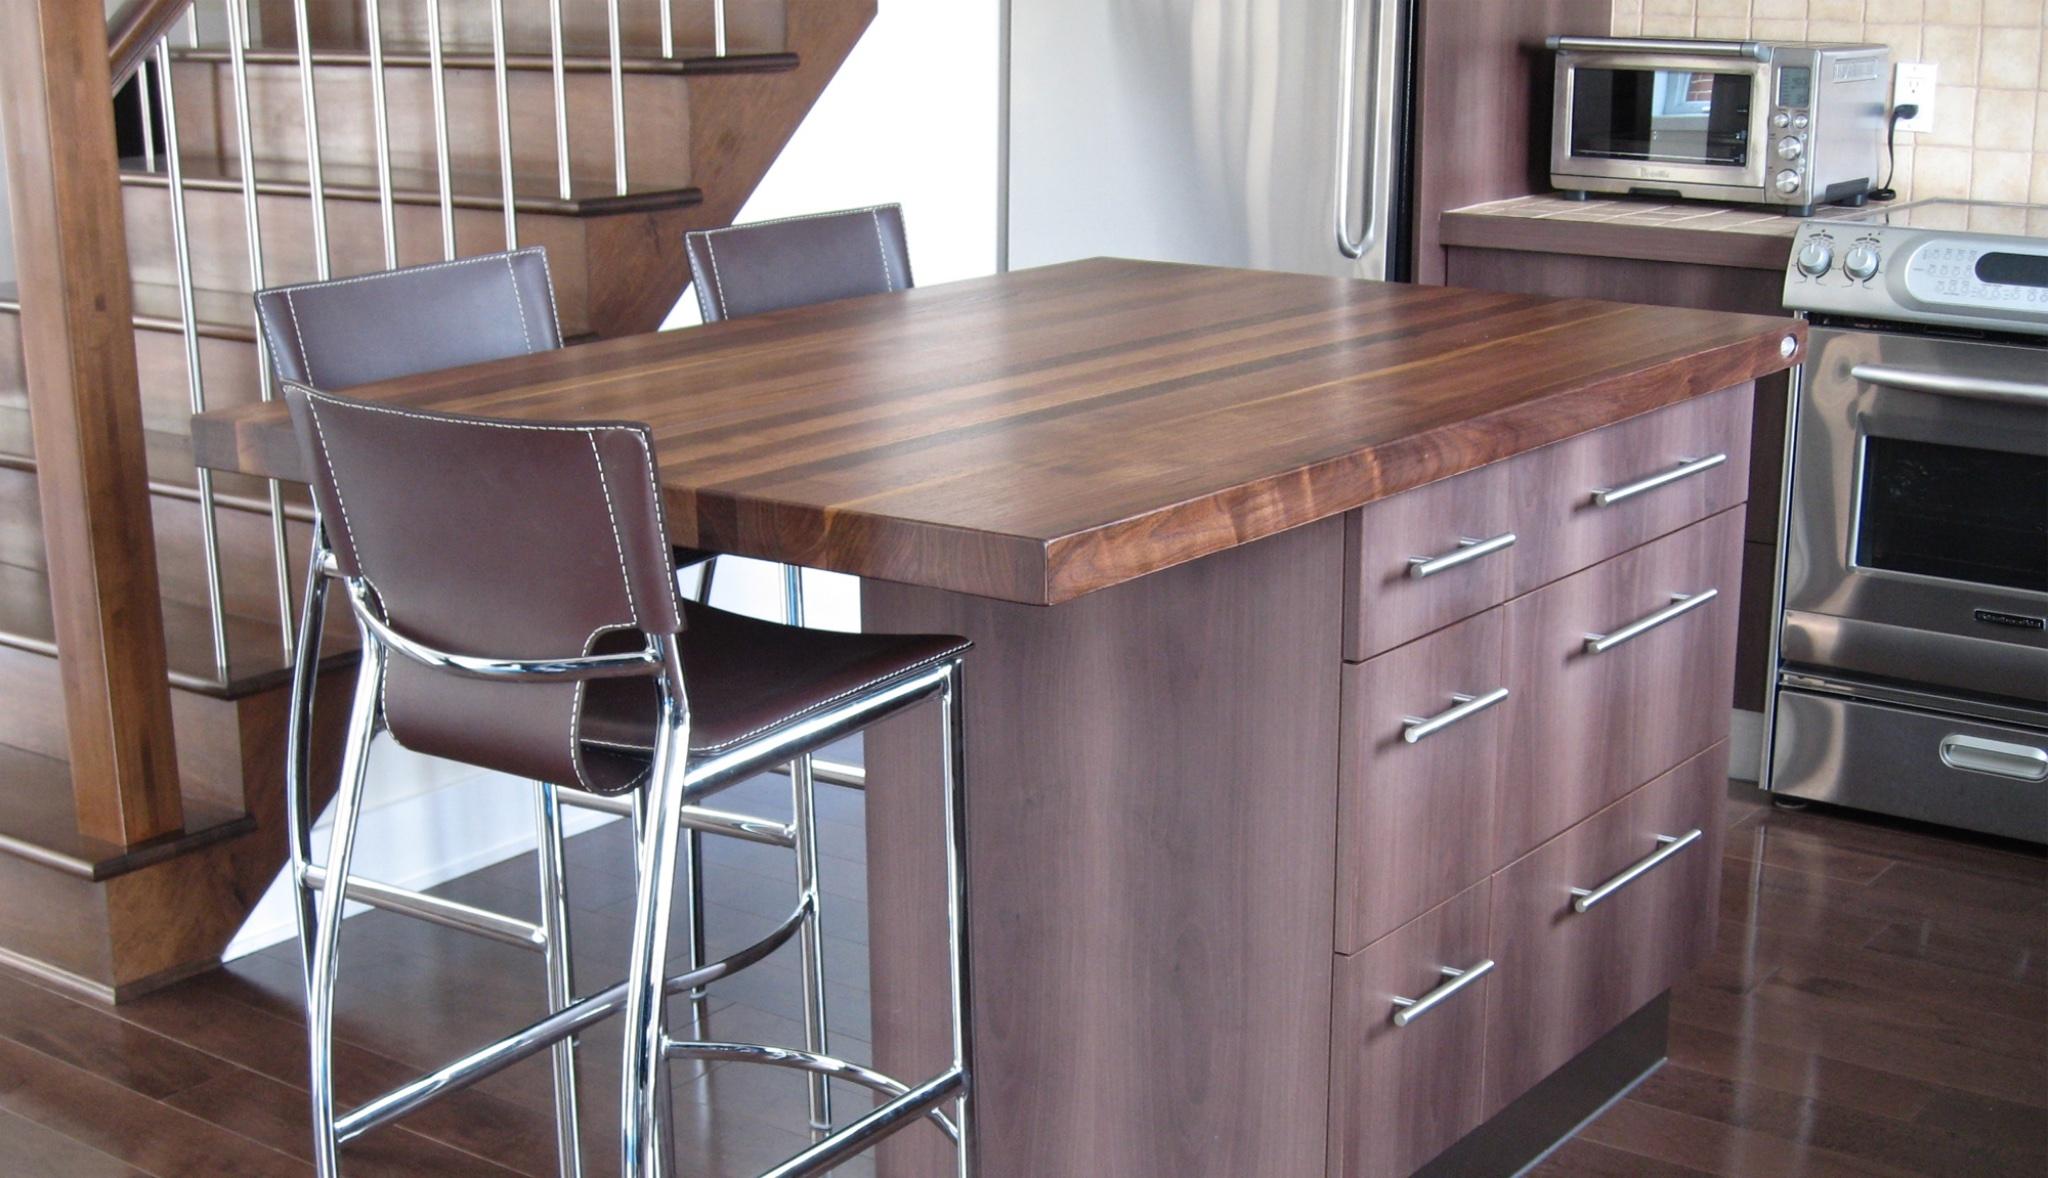 comptoirs en bois signature st phane dion. Black Bedroom Furniture Sets. Home Design Ideas